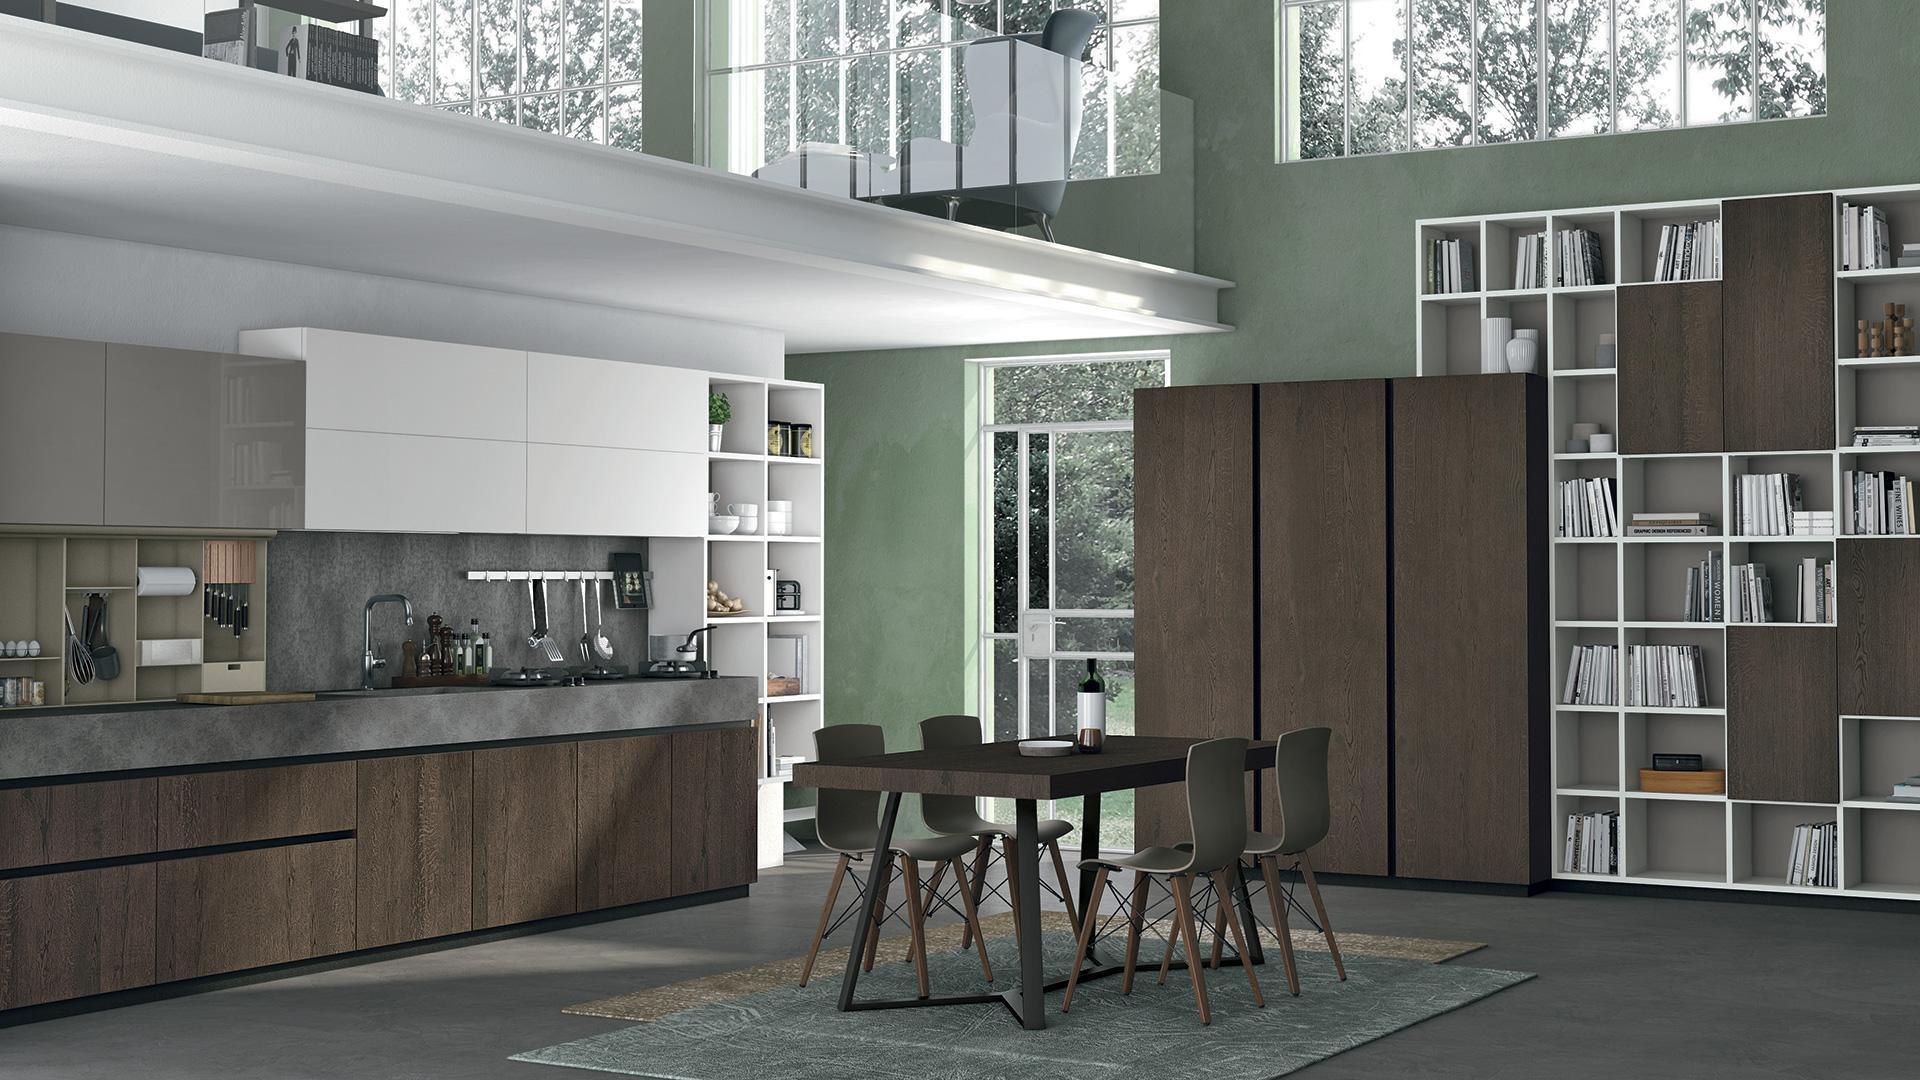 Tavoli E Sedie Per Cucina Moderna. Excellent Unico Emejing Tavoli E ...